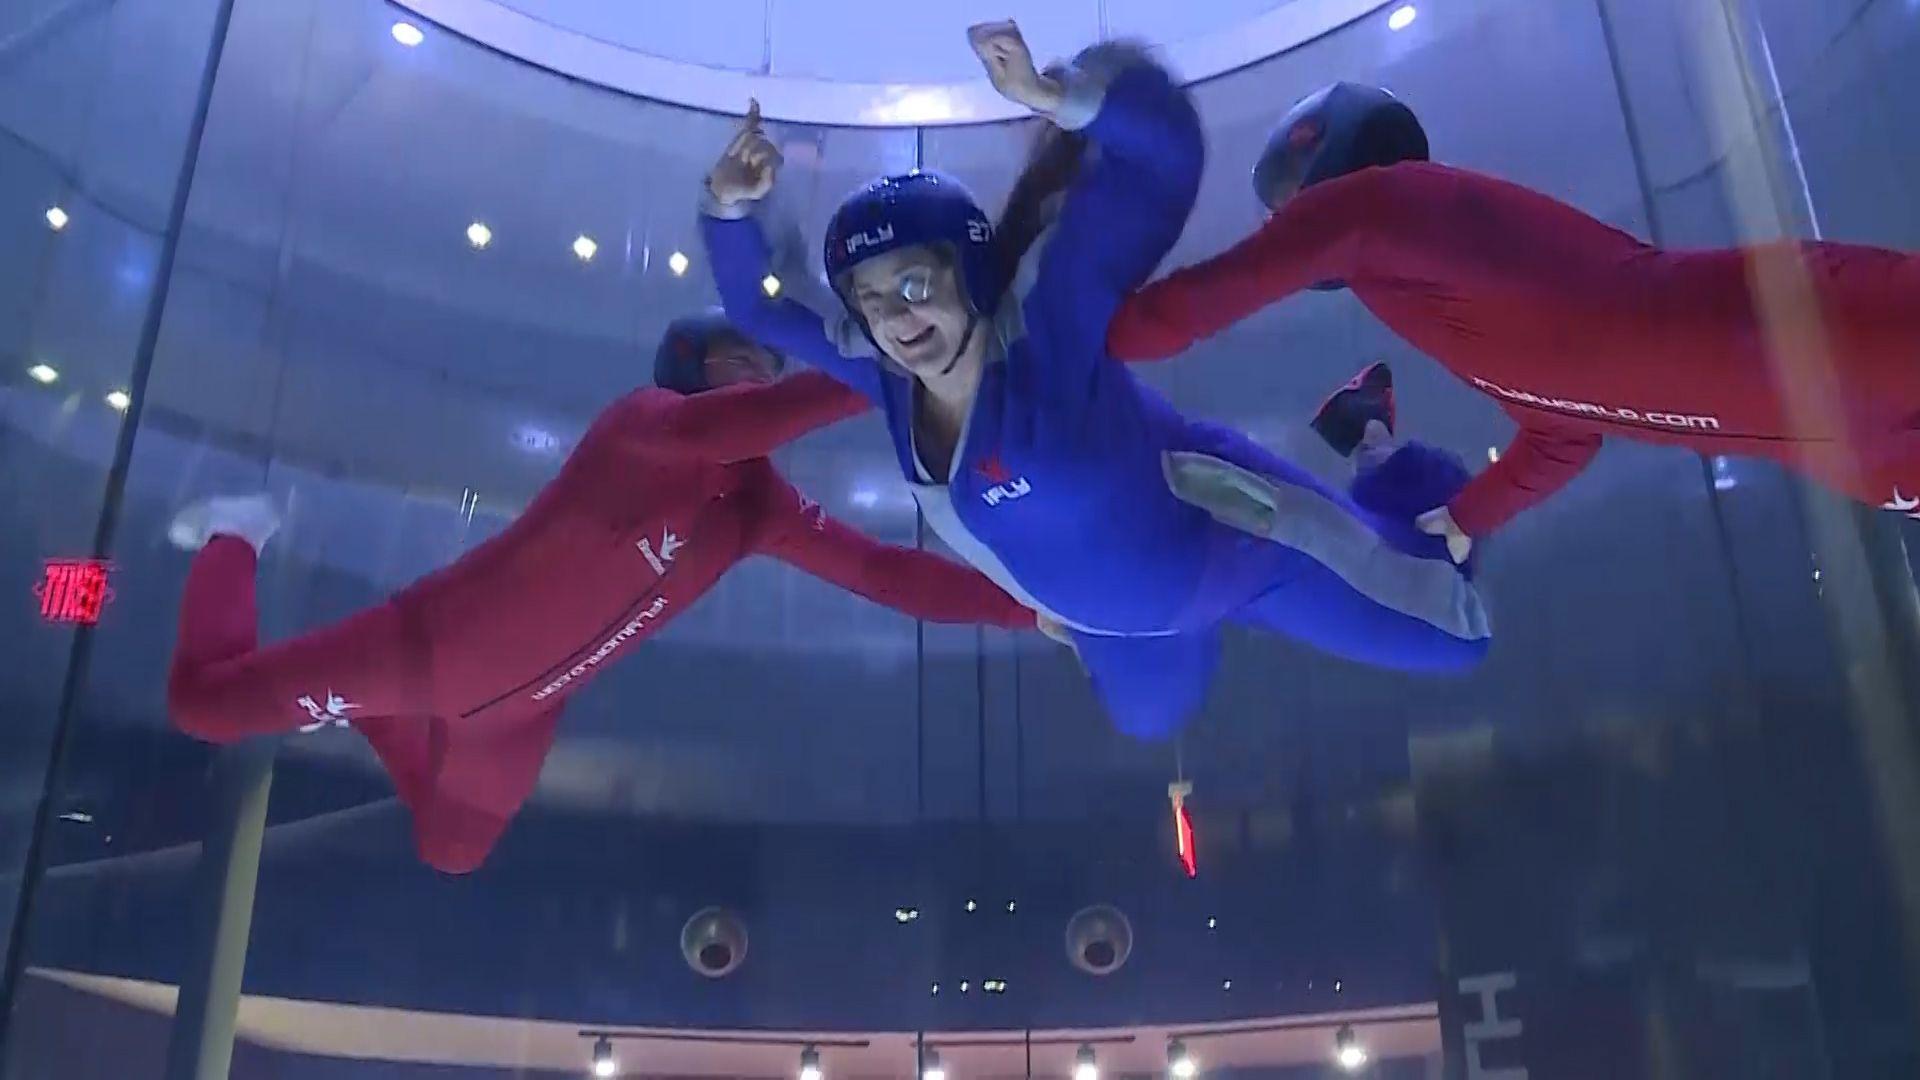 bhdn op indoor skydiving helps kids sotvo kmbc st1 10000000000991ea 136 1 mp4 still001 1493310470 jpg